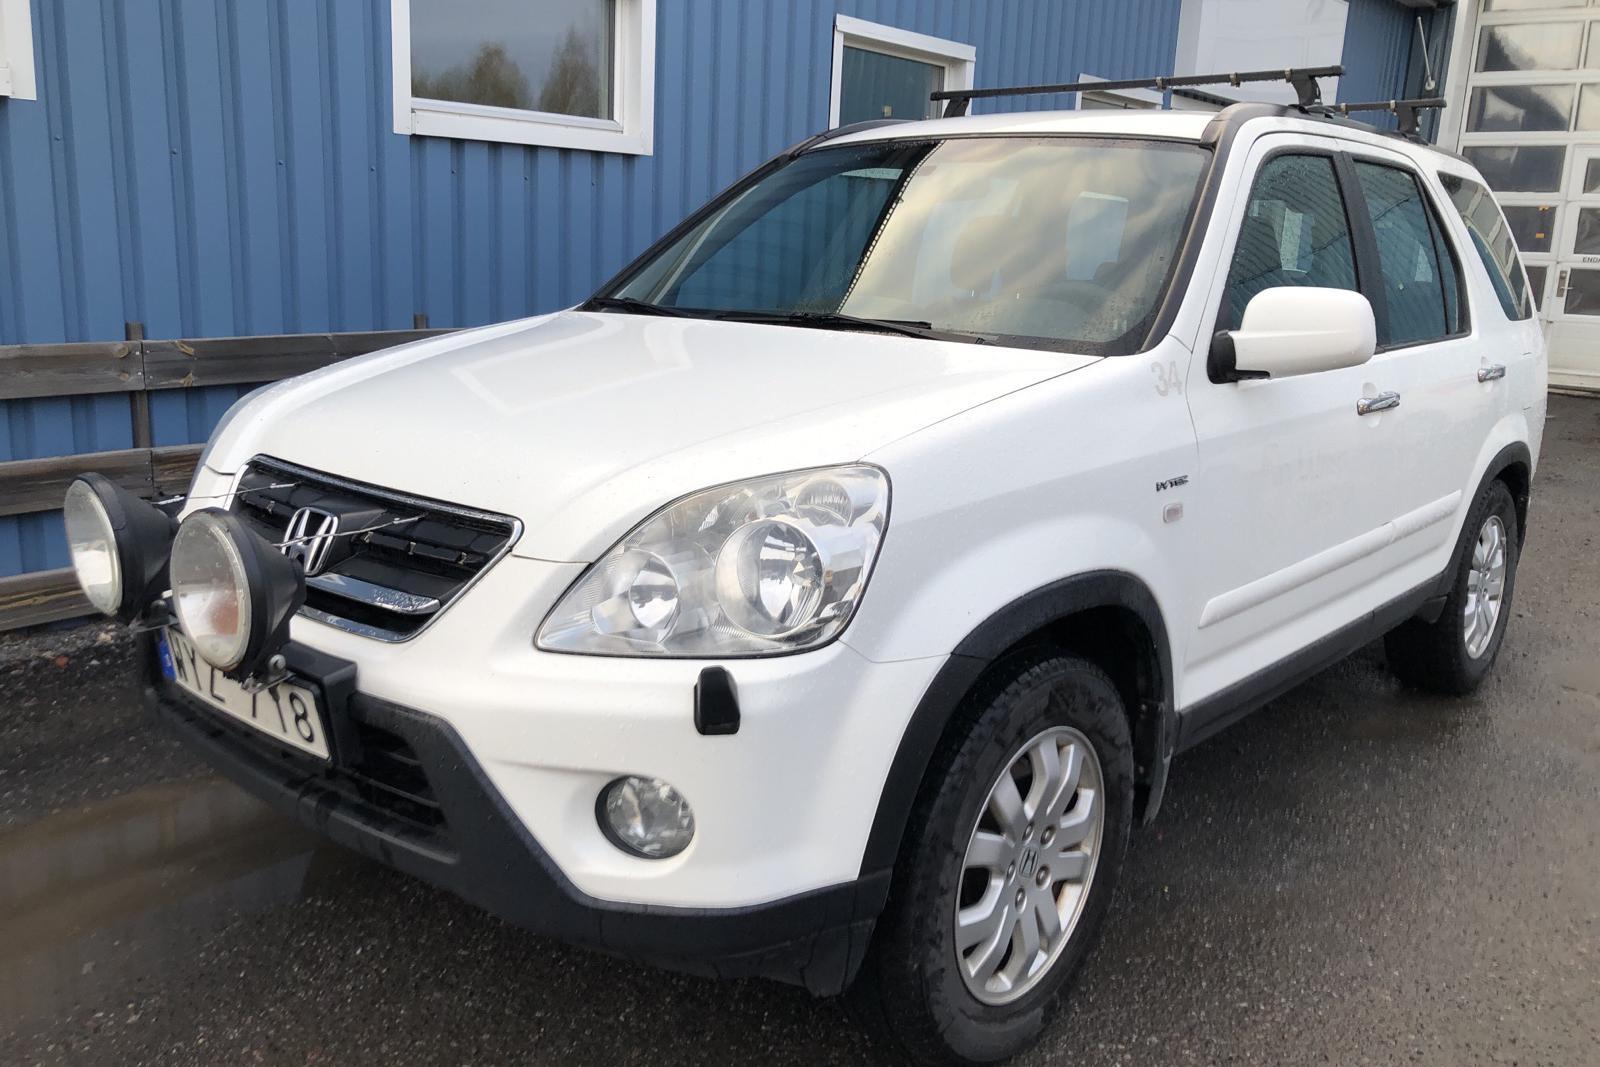 Honda CR-V 2.0 (150hk) - 215 830 km - Automatic - white - 2005